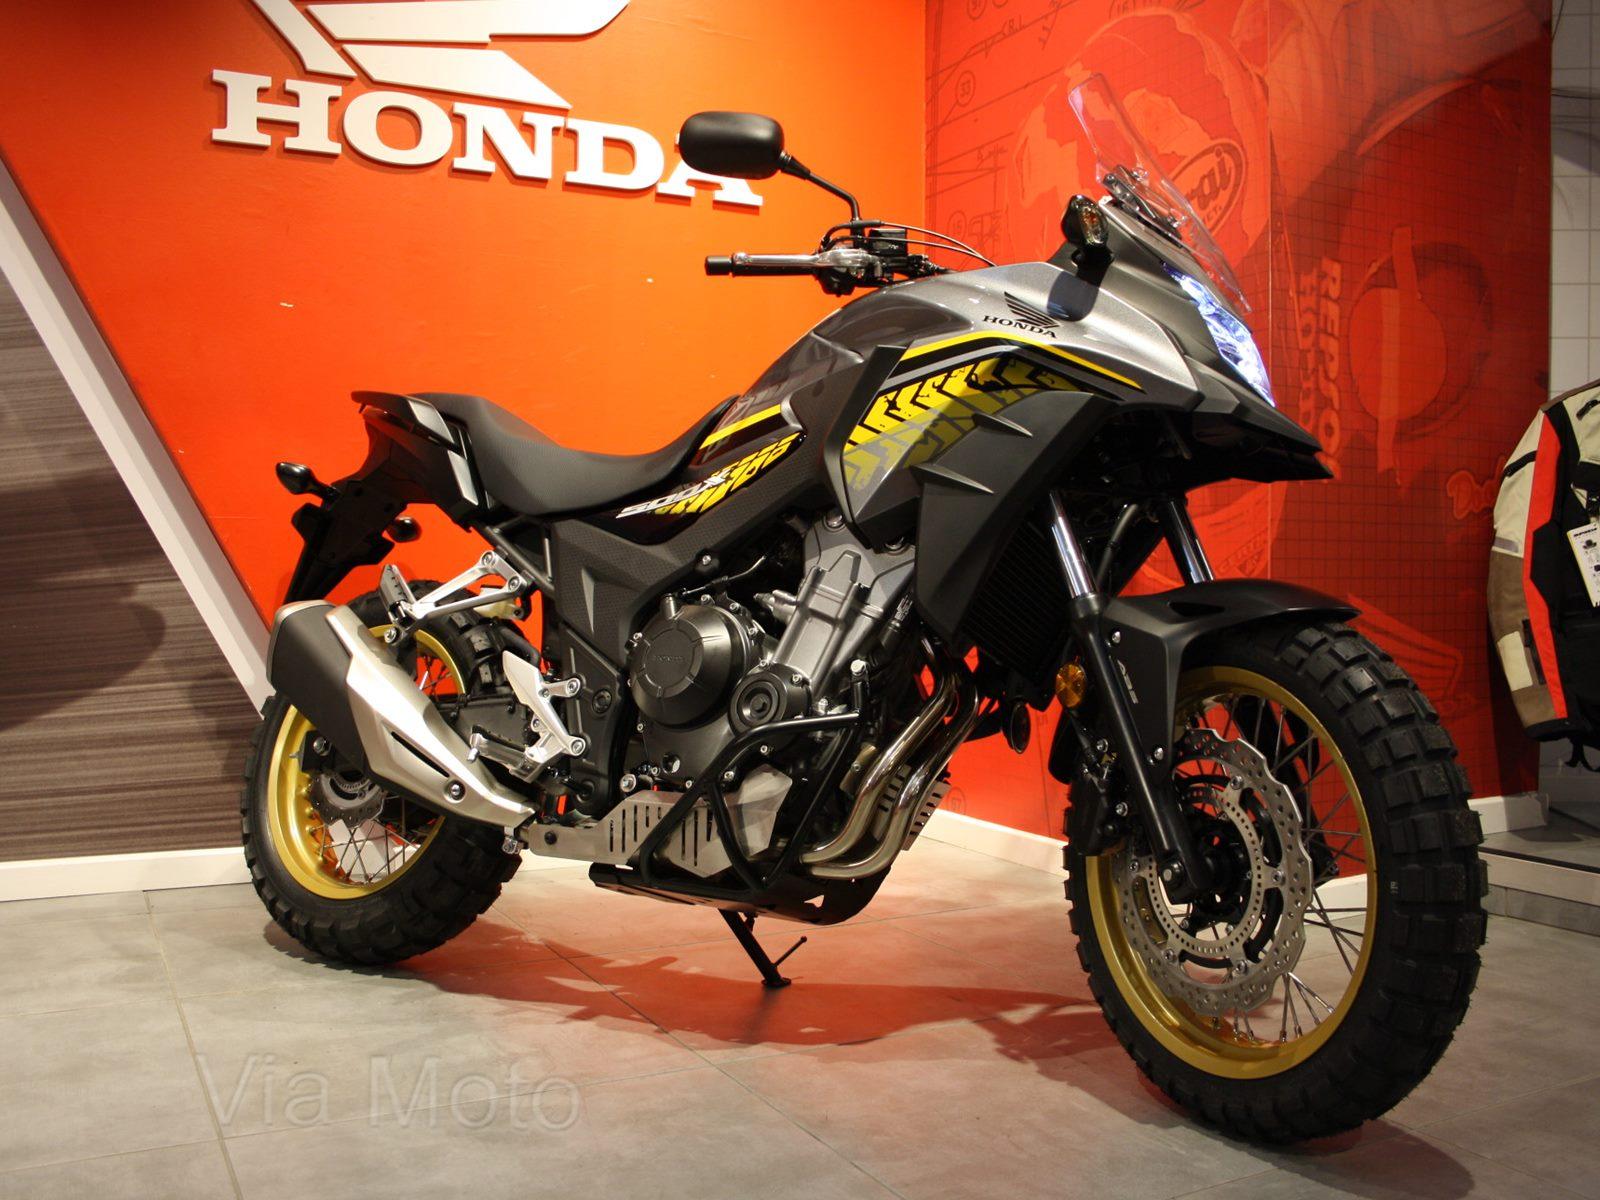 HONDA CB500X RALLY RAID Edition Only 35 Miles